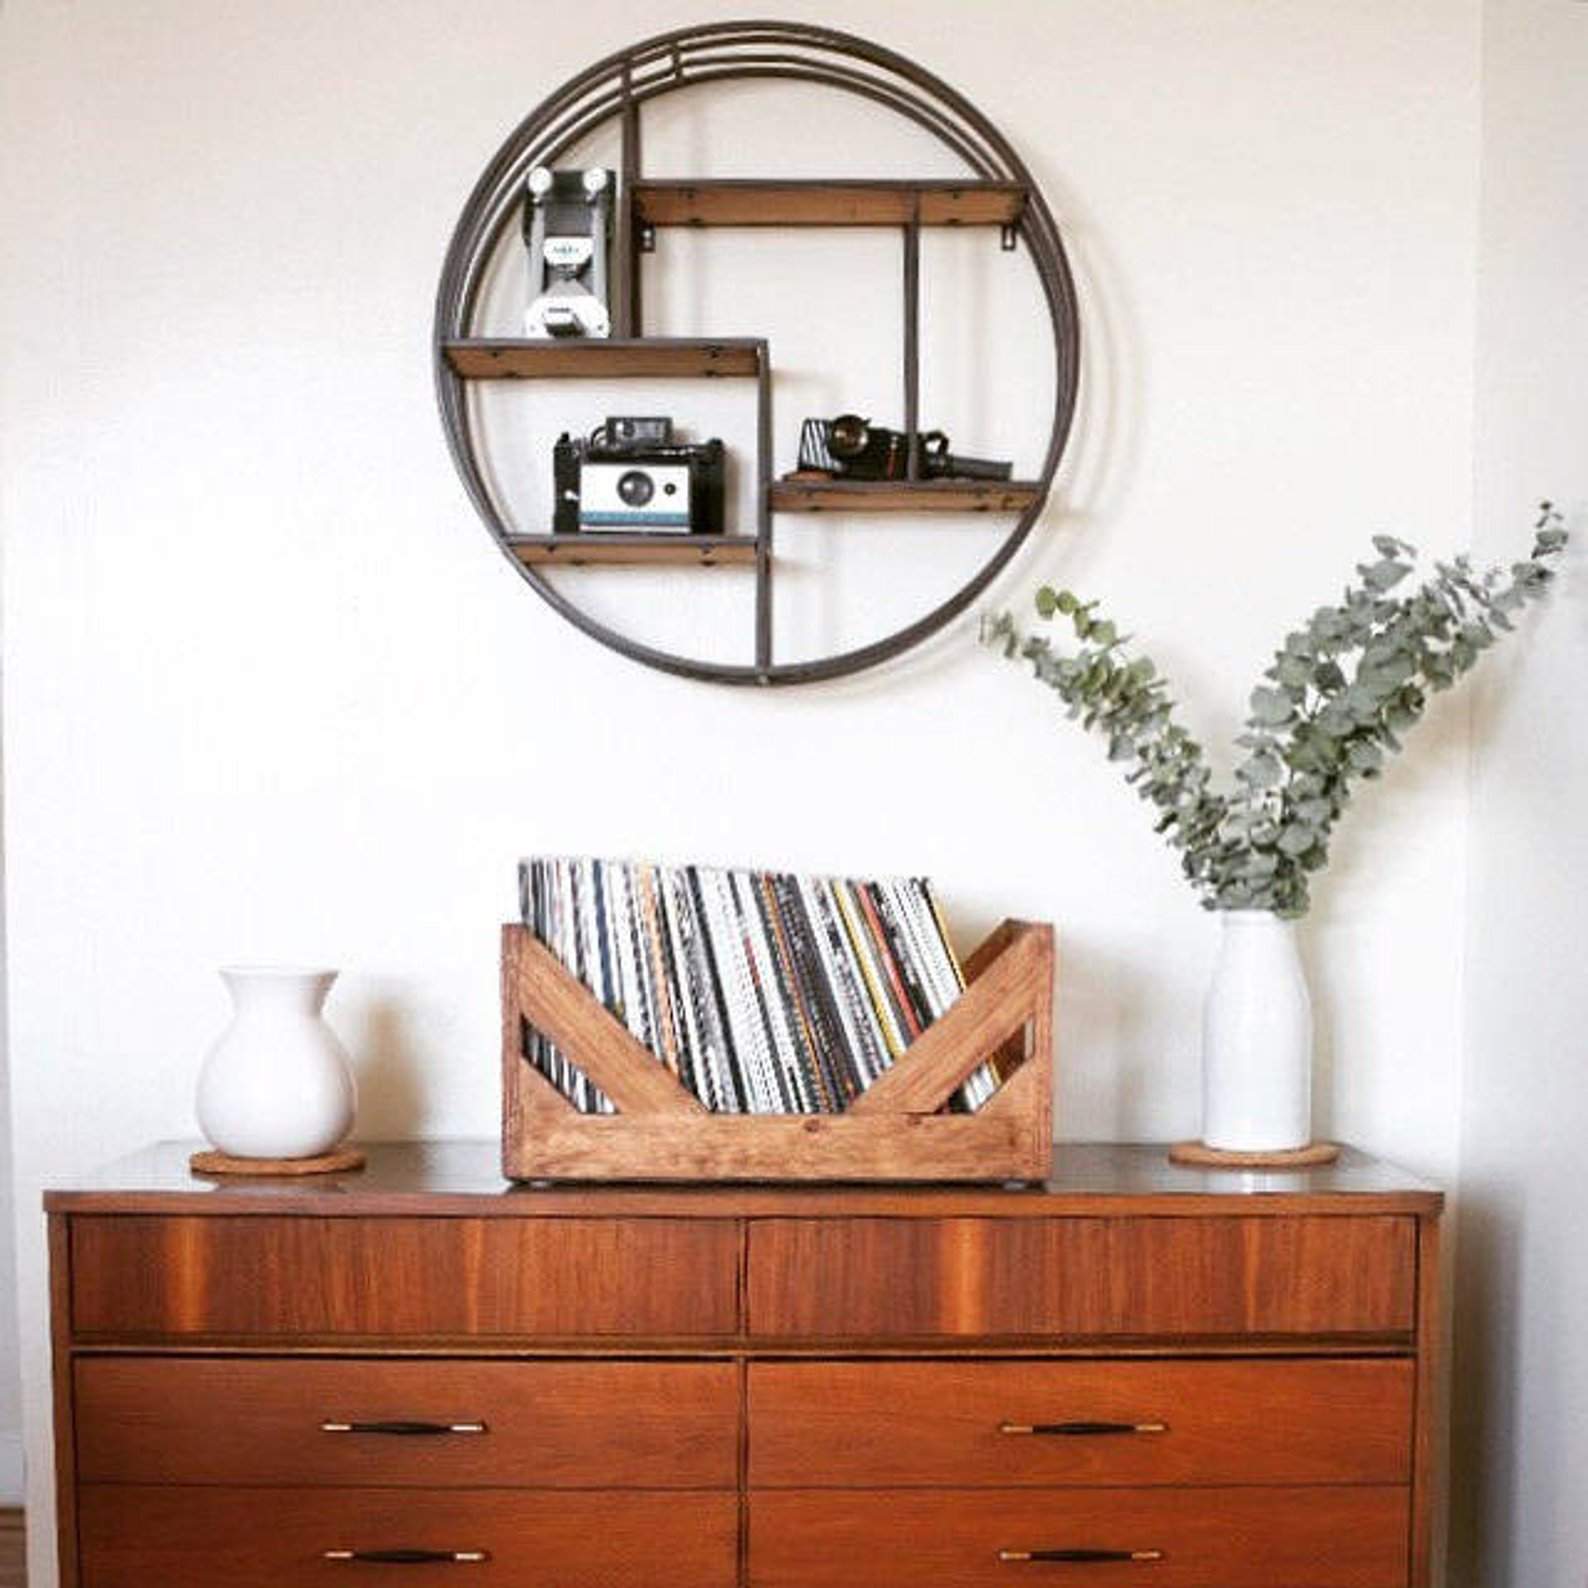 Vinyl Record Storage By Wicker Wood Works